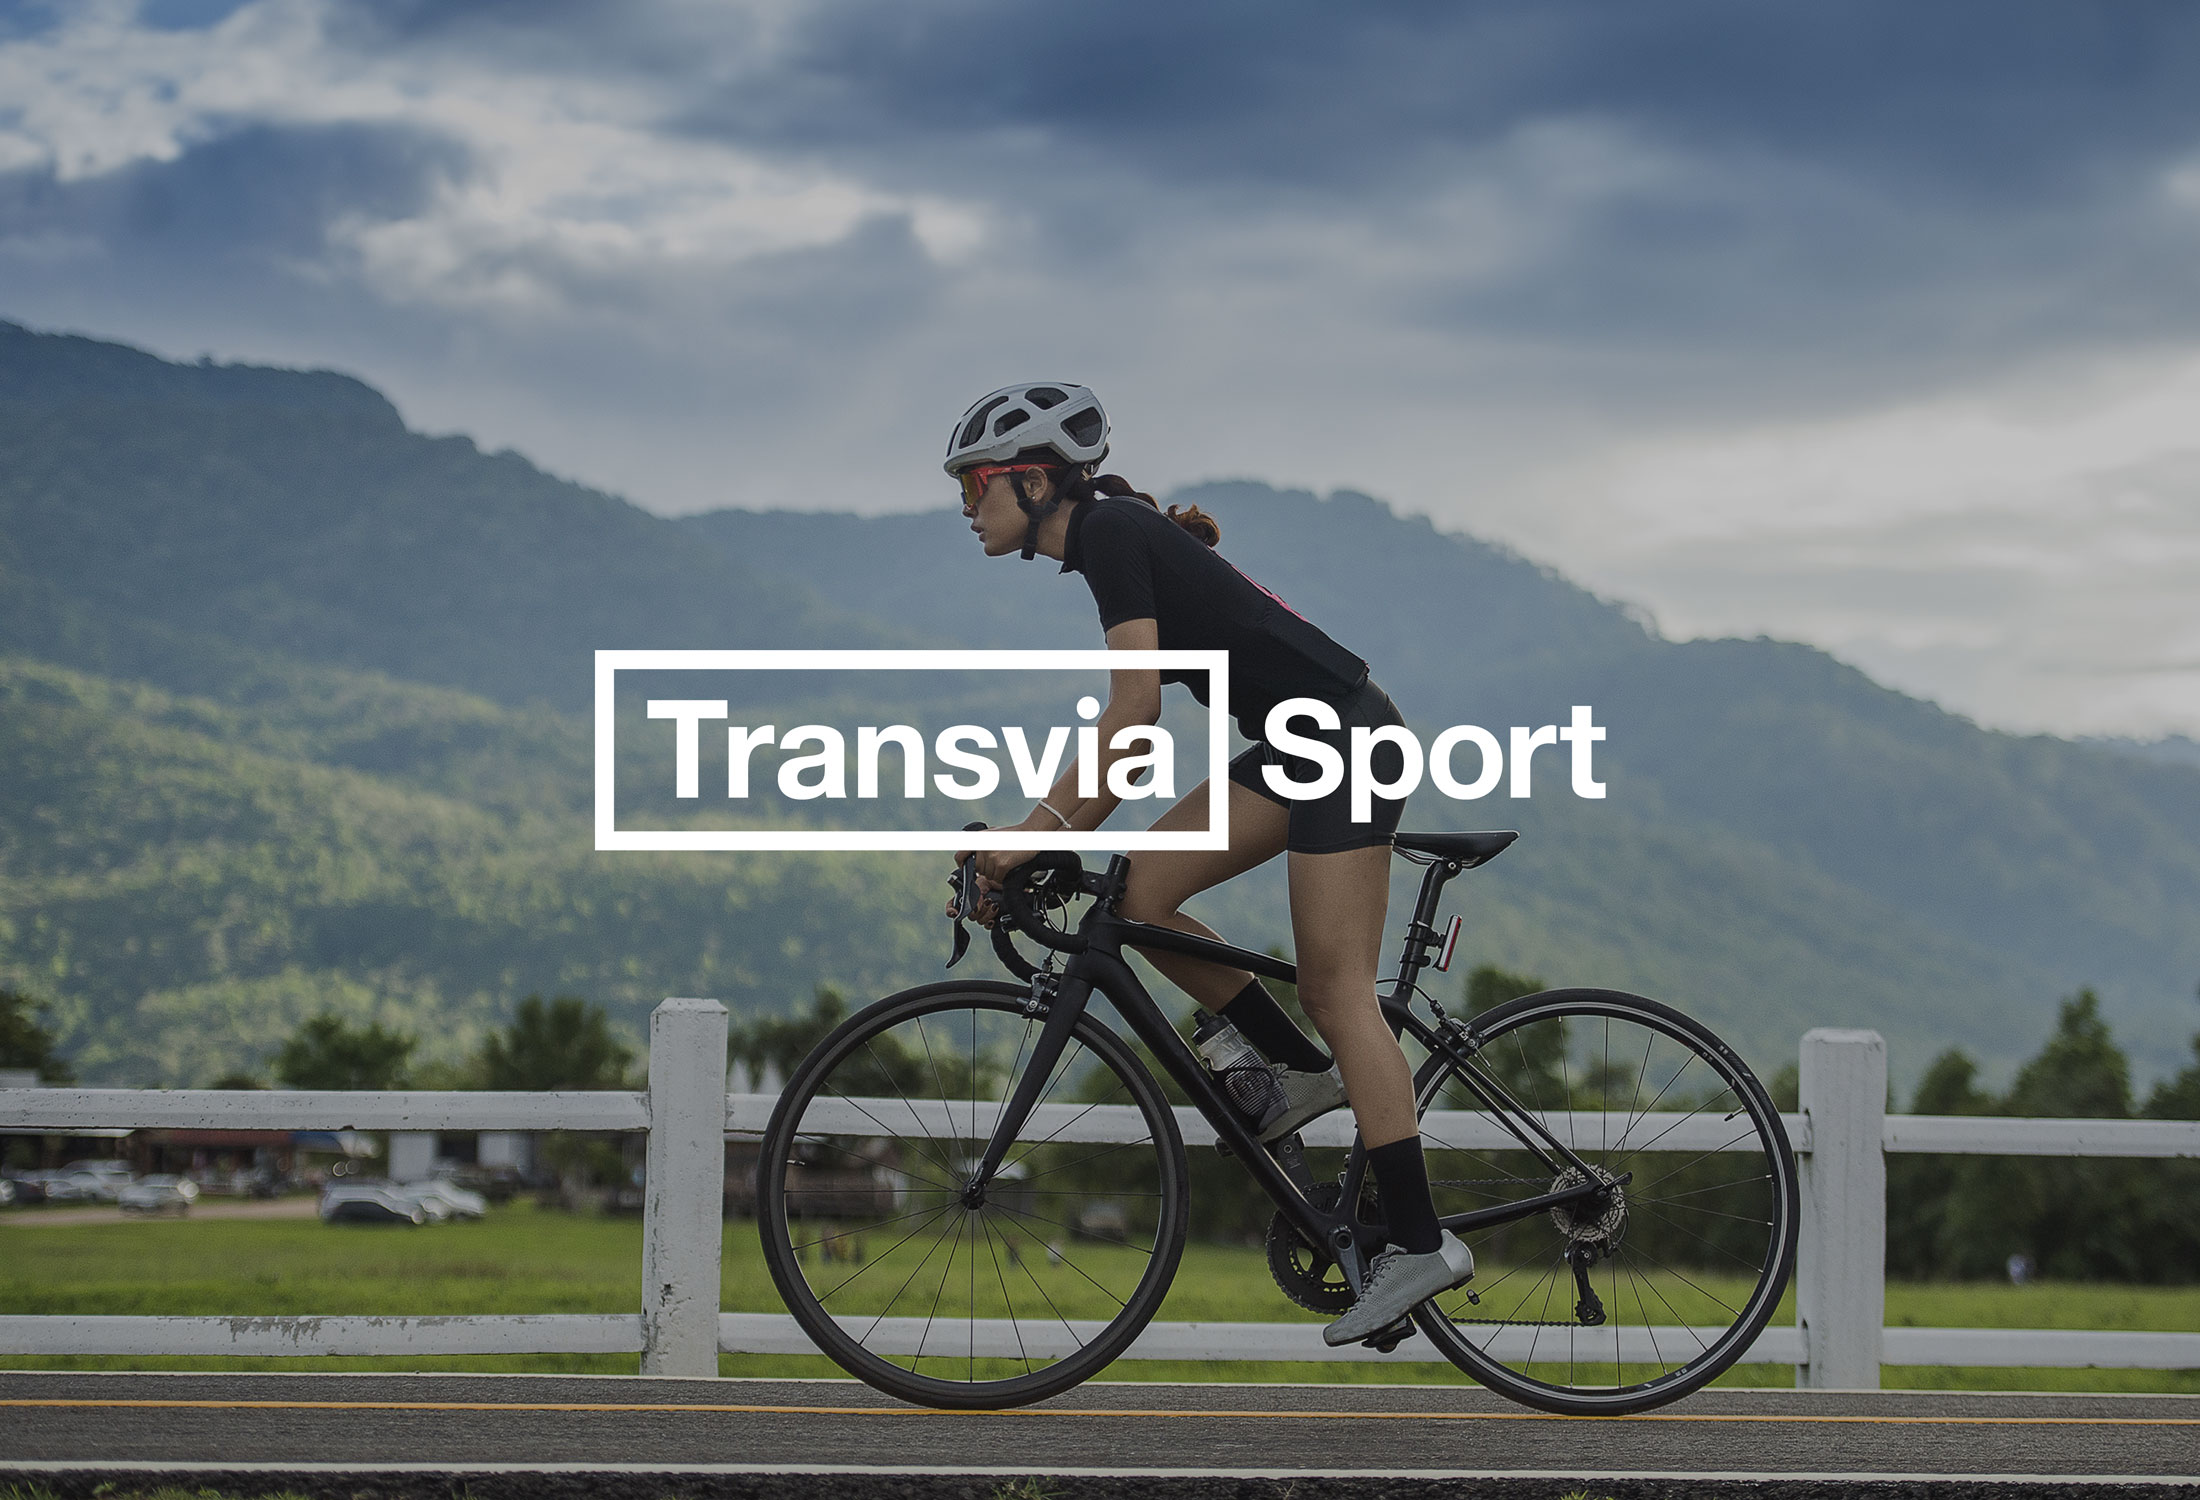 transvia sport